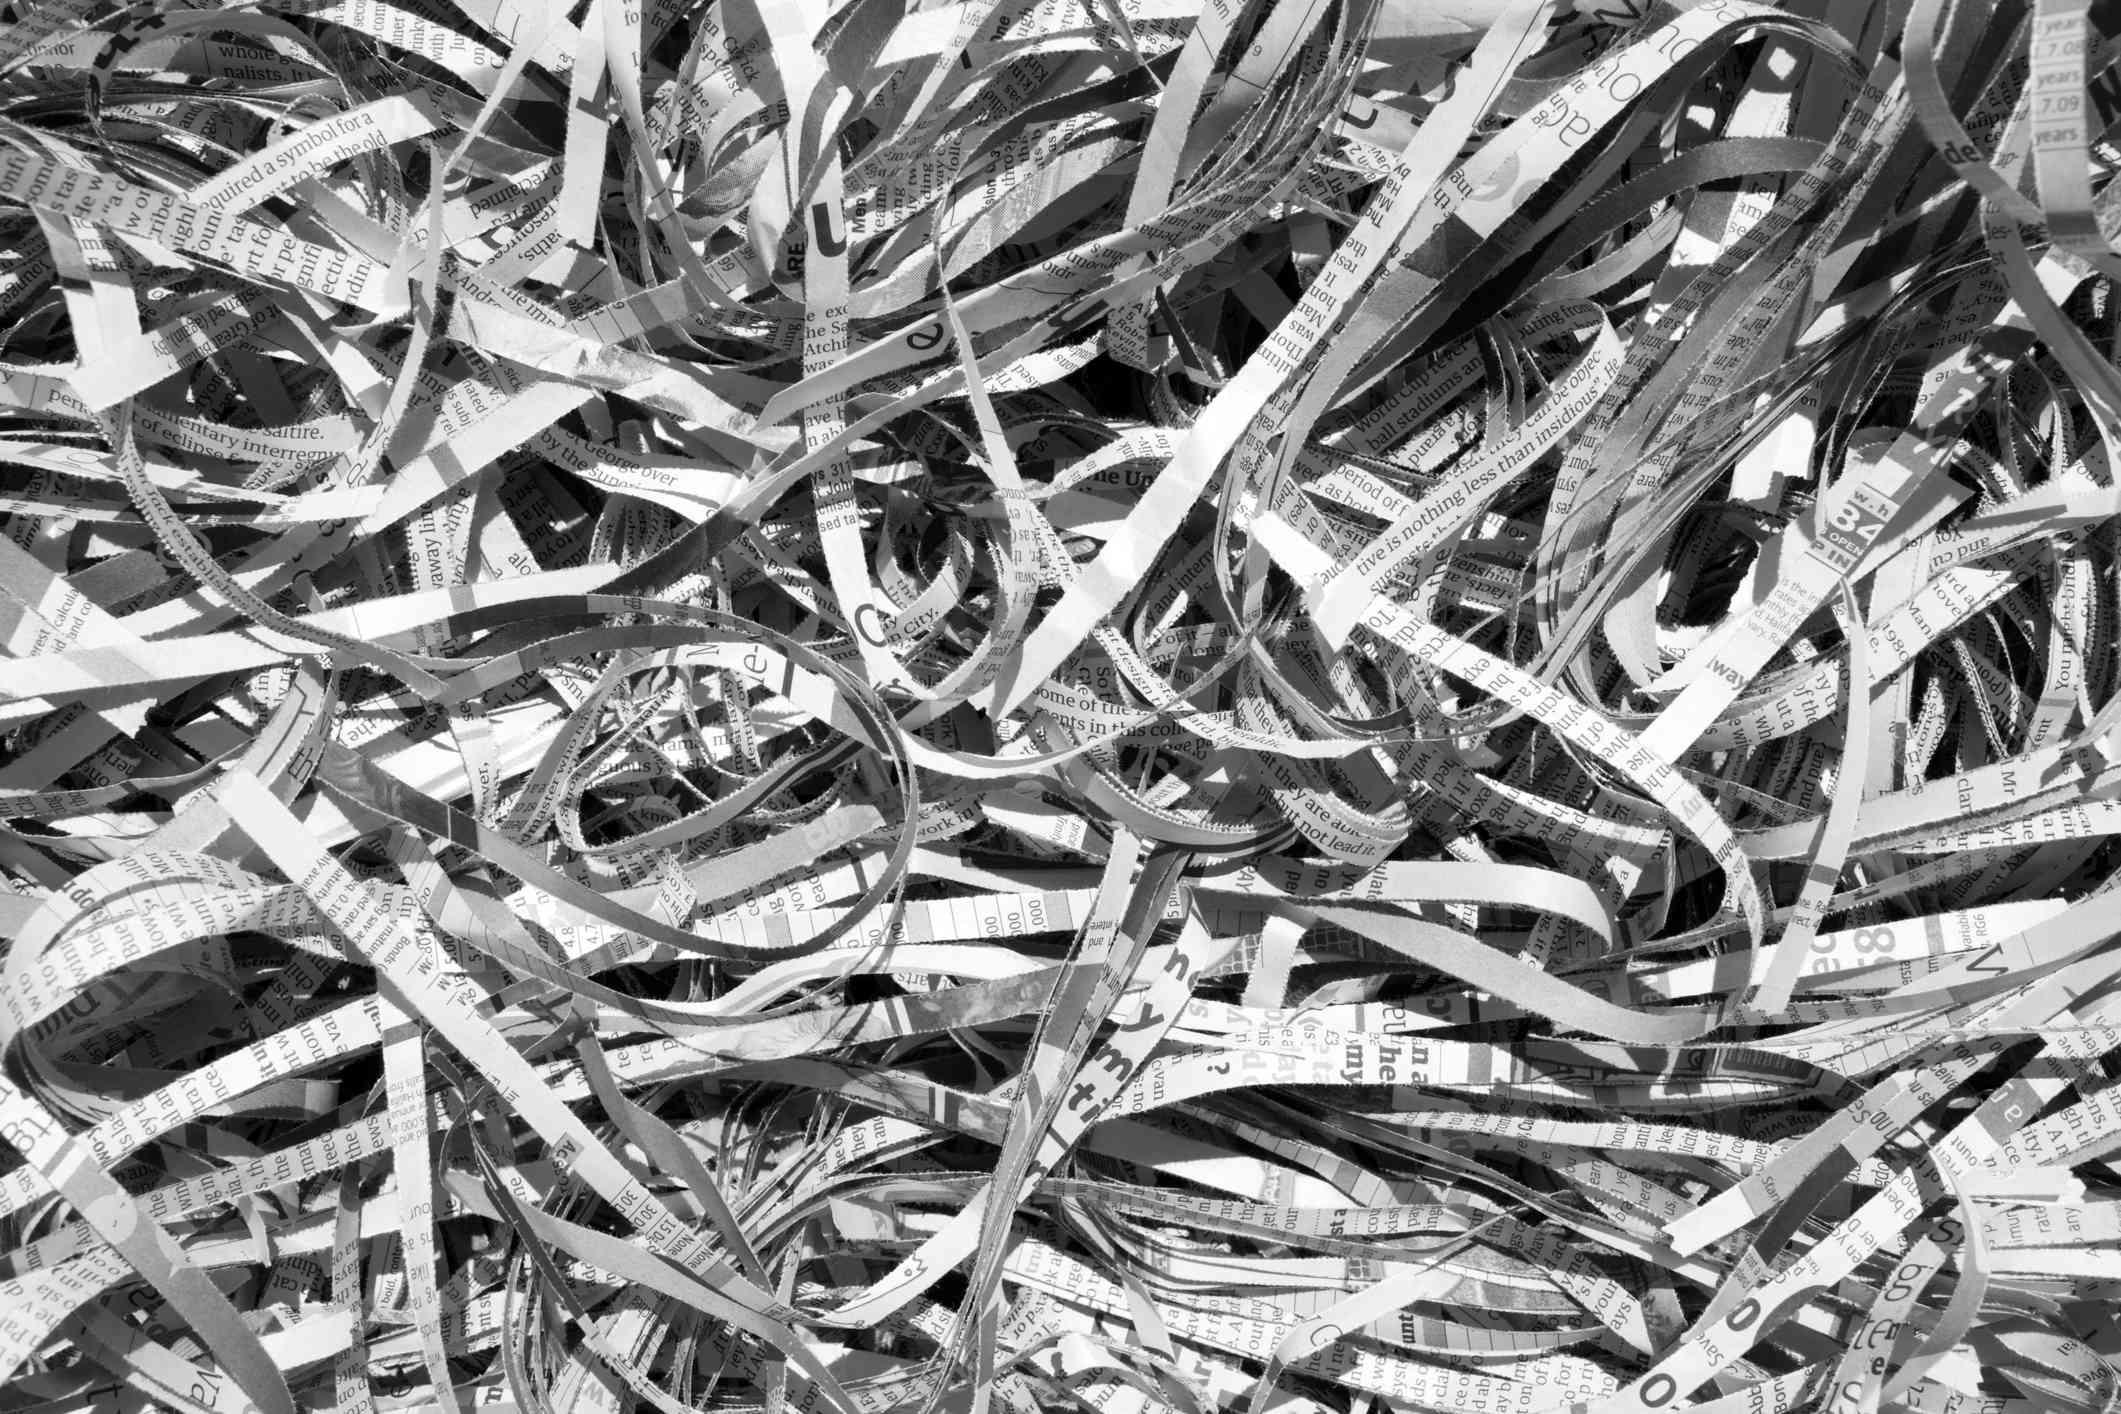 shredded newspaper